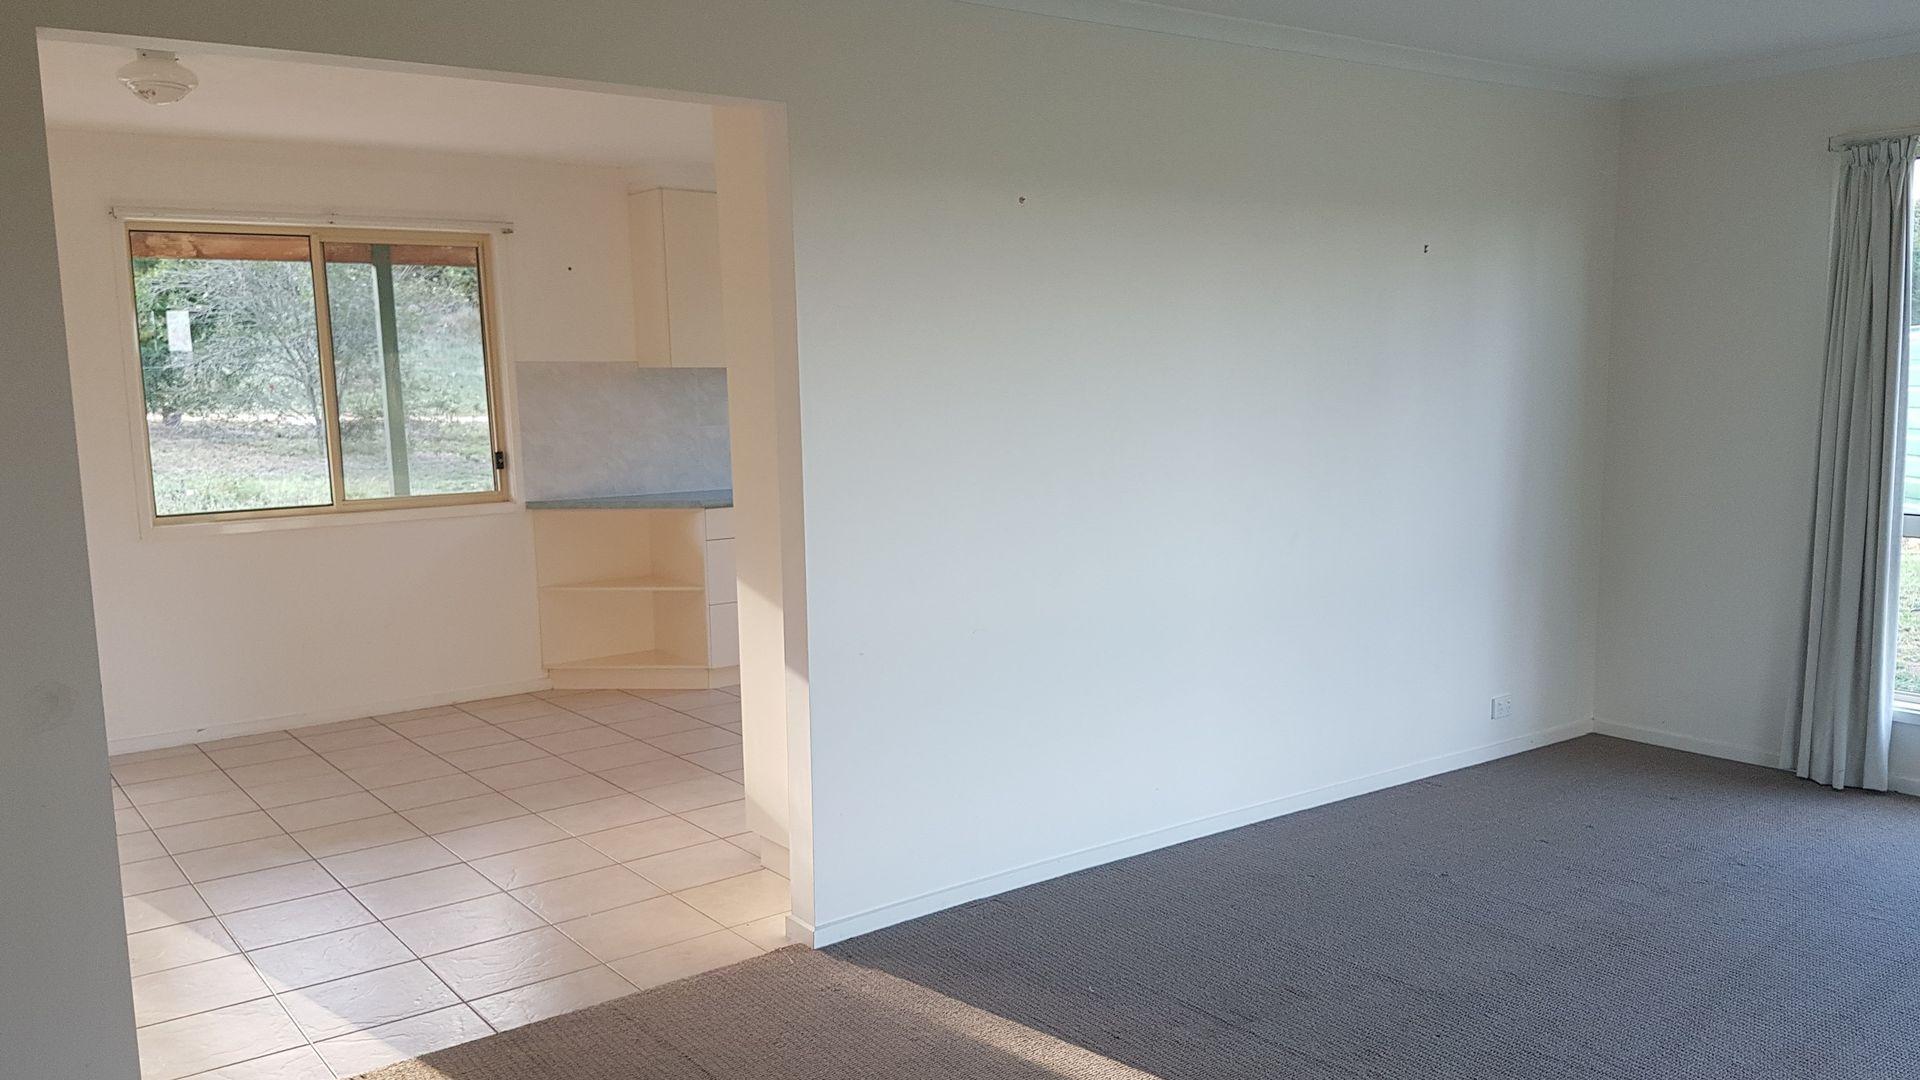 60 Cartwright Avenue, Sutton NSW 2620, Image 1